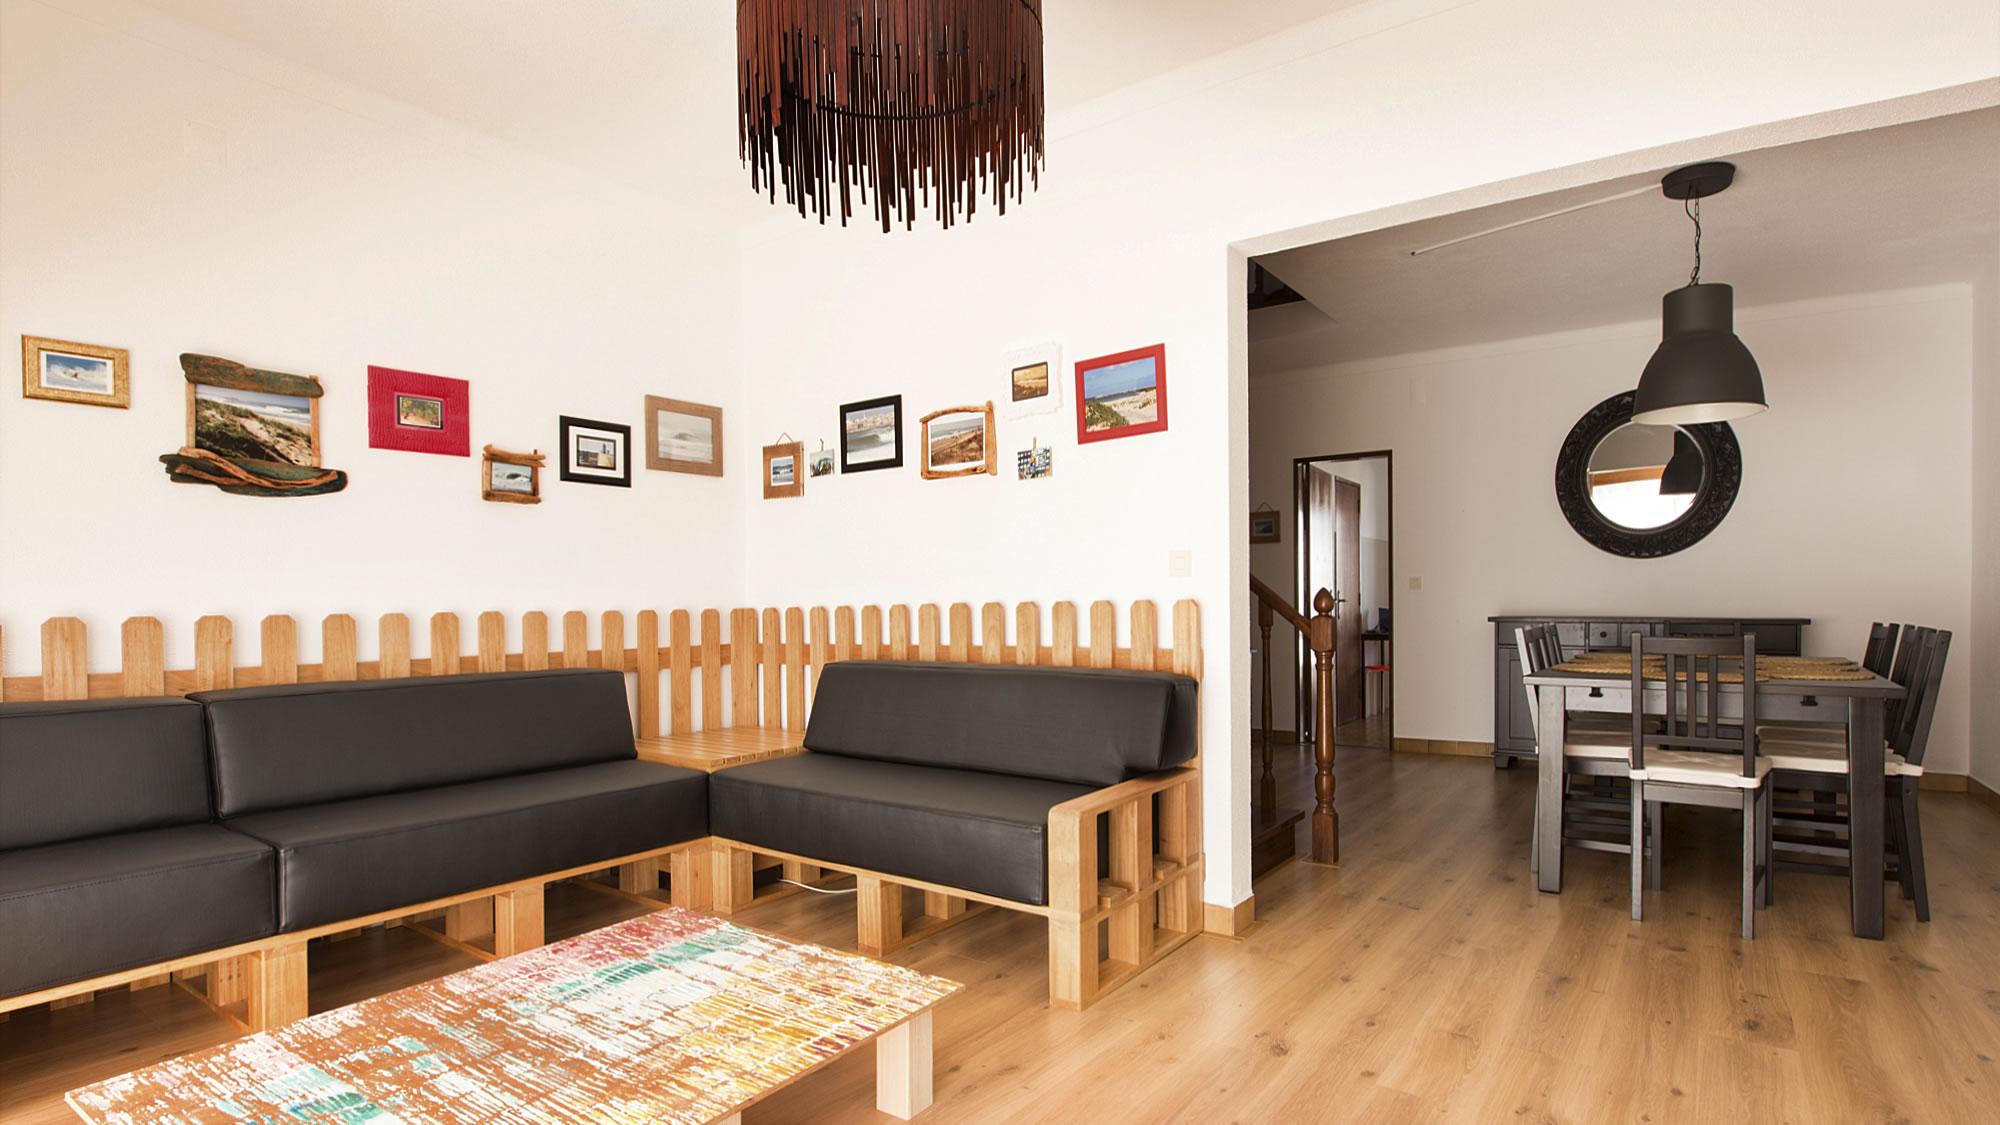 Super Tubos Living Room Baleal Surf Camp Baleal Surf Camp  # Muebles Con Tuvos